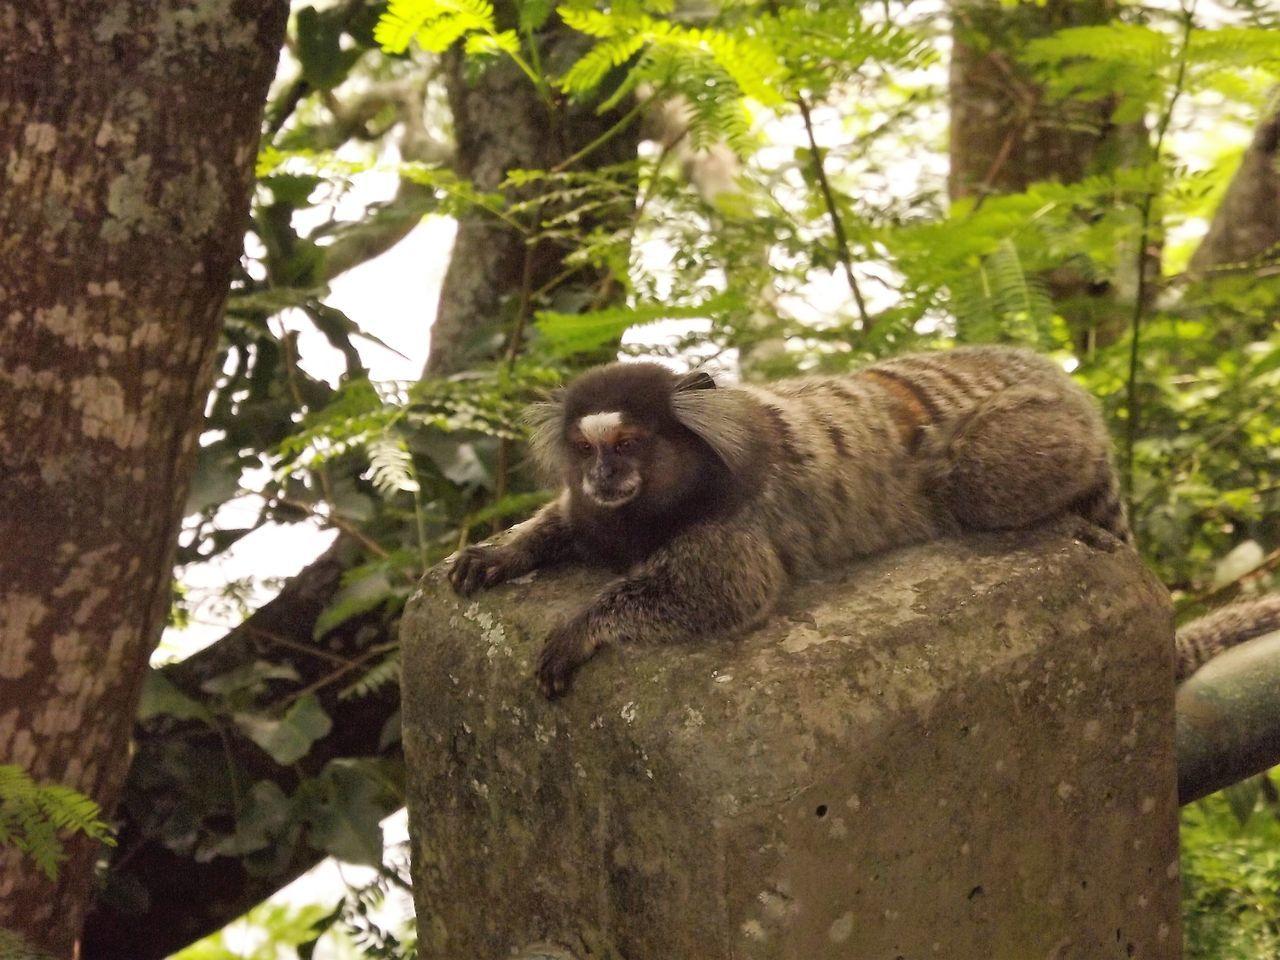 Animal On Tree Trunk